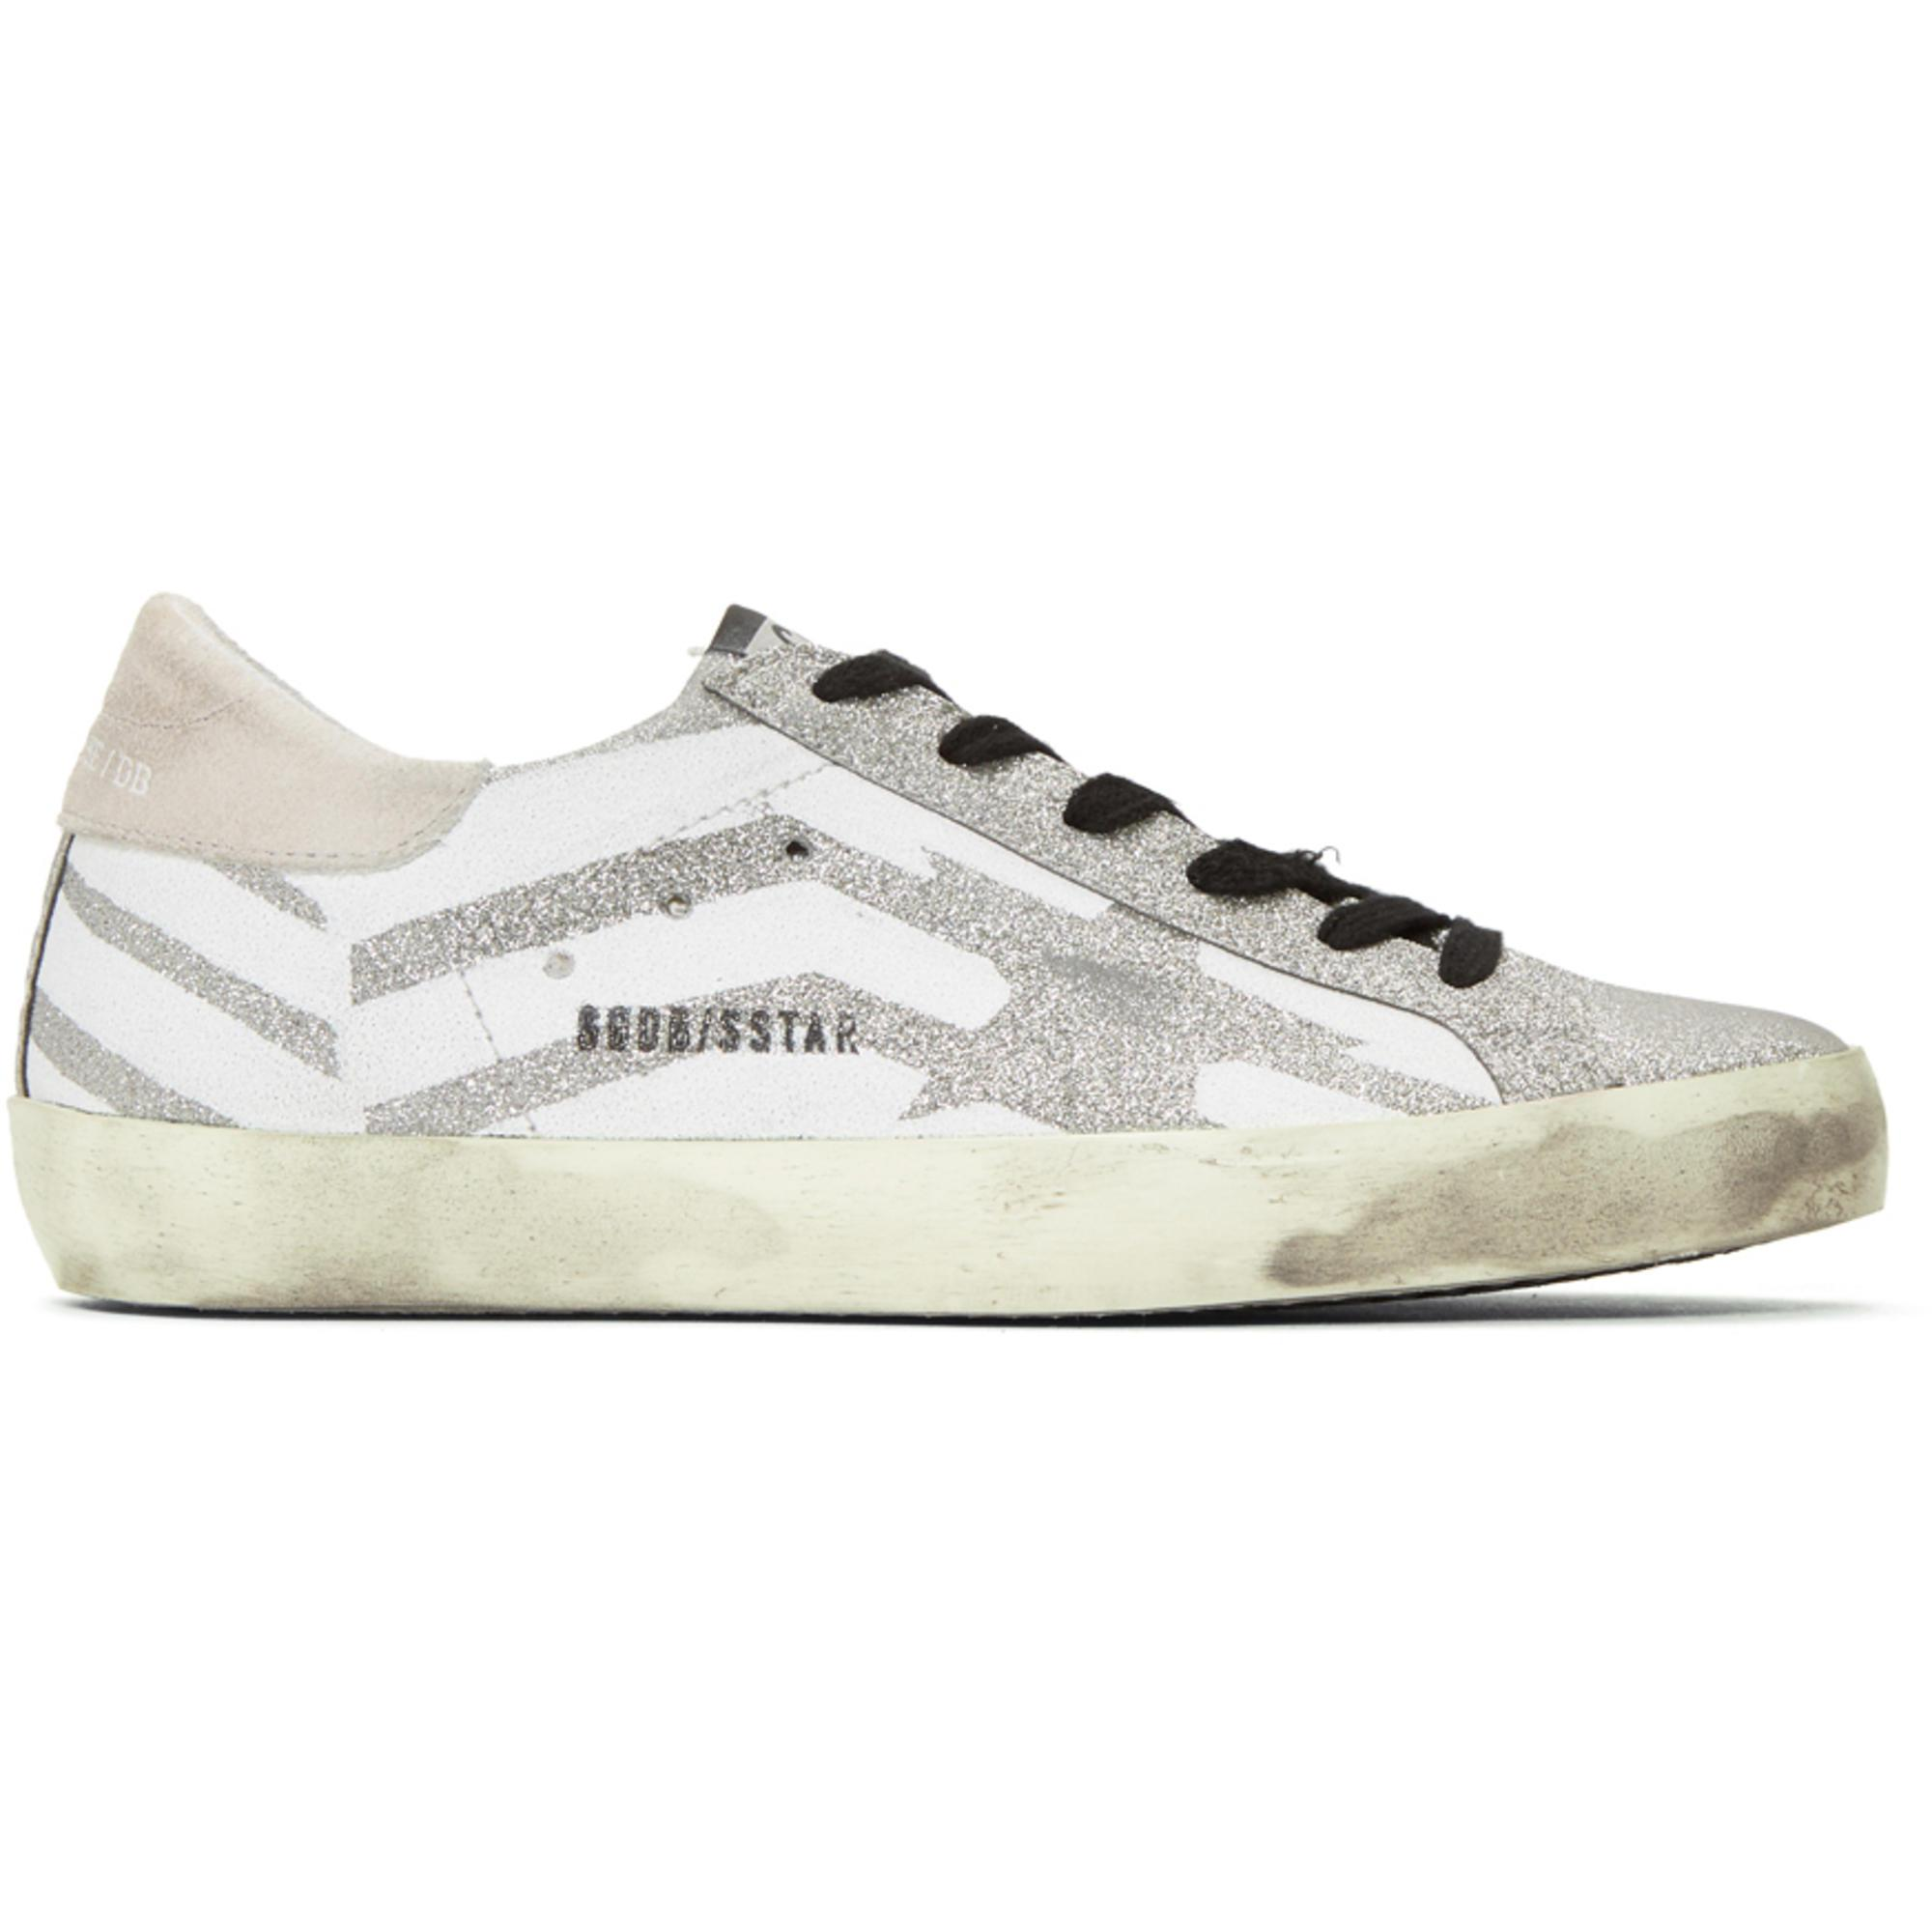 eb3bf85570 Golden Goose Deluxe Brand Metallic Silver Glitter Star And Flag Superstar  Sneakers for men